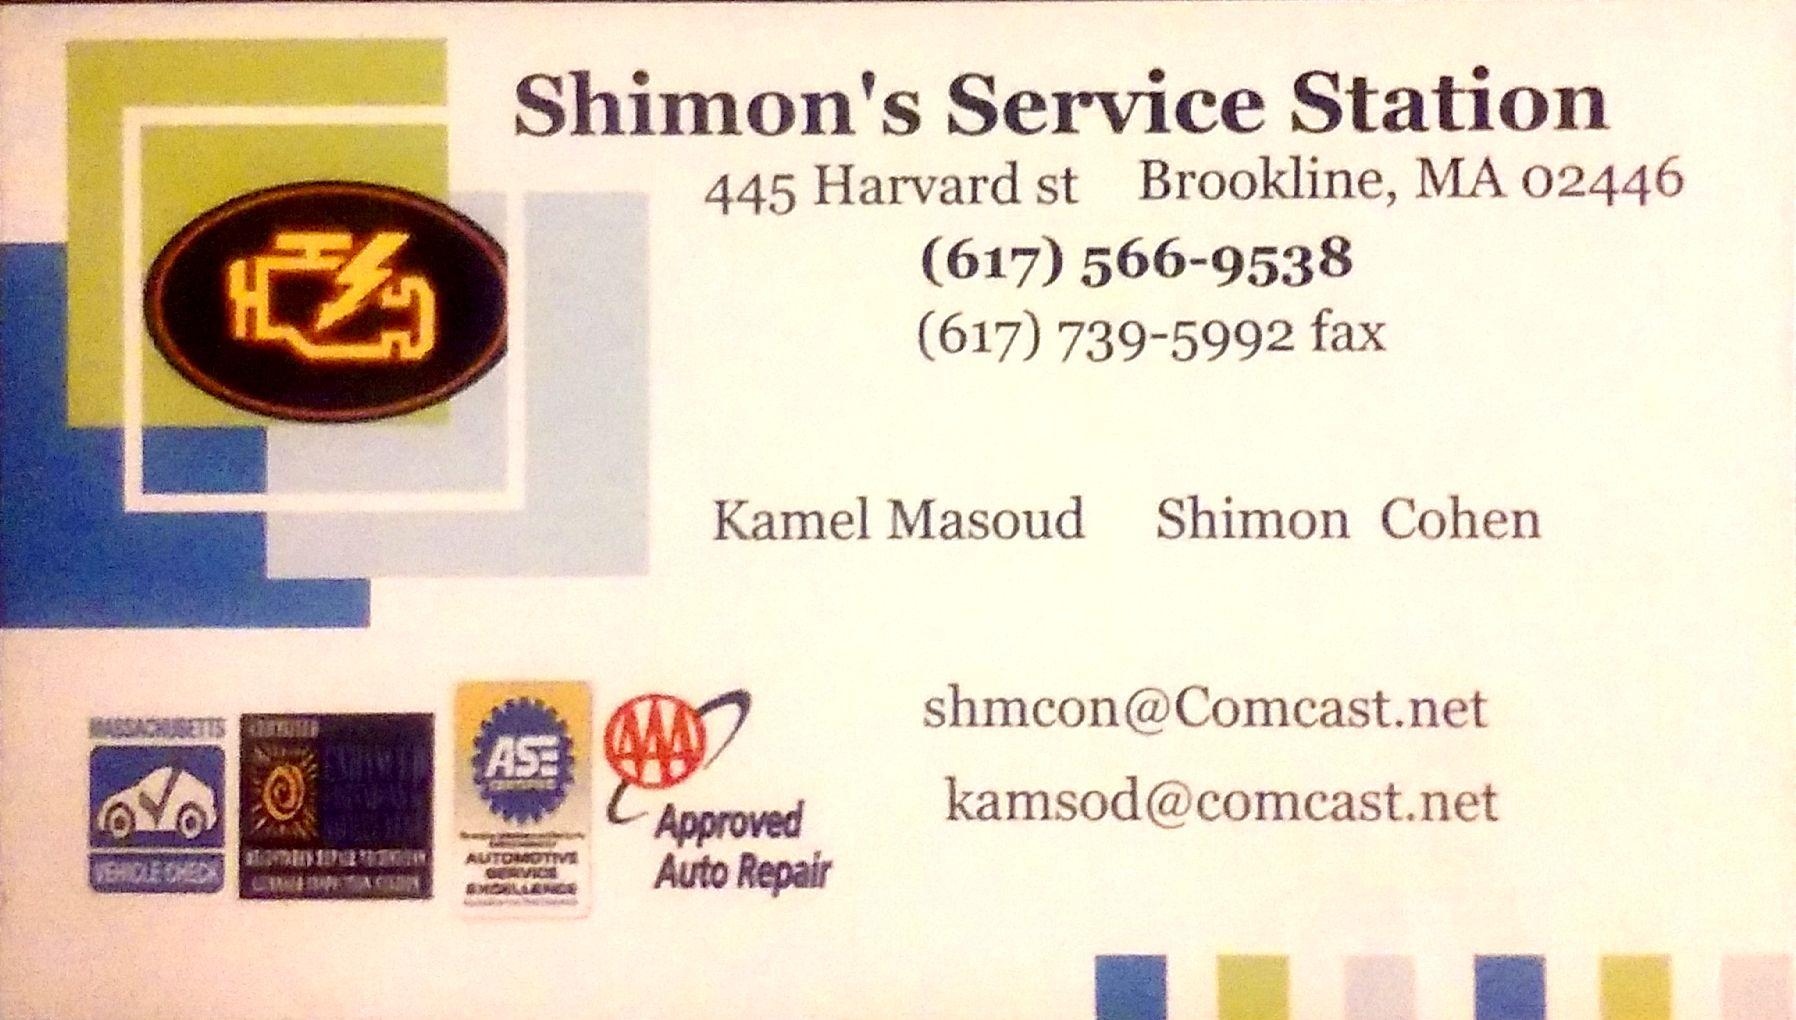 Shimon's Service Station, Brookline, MA